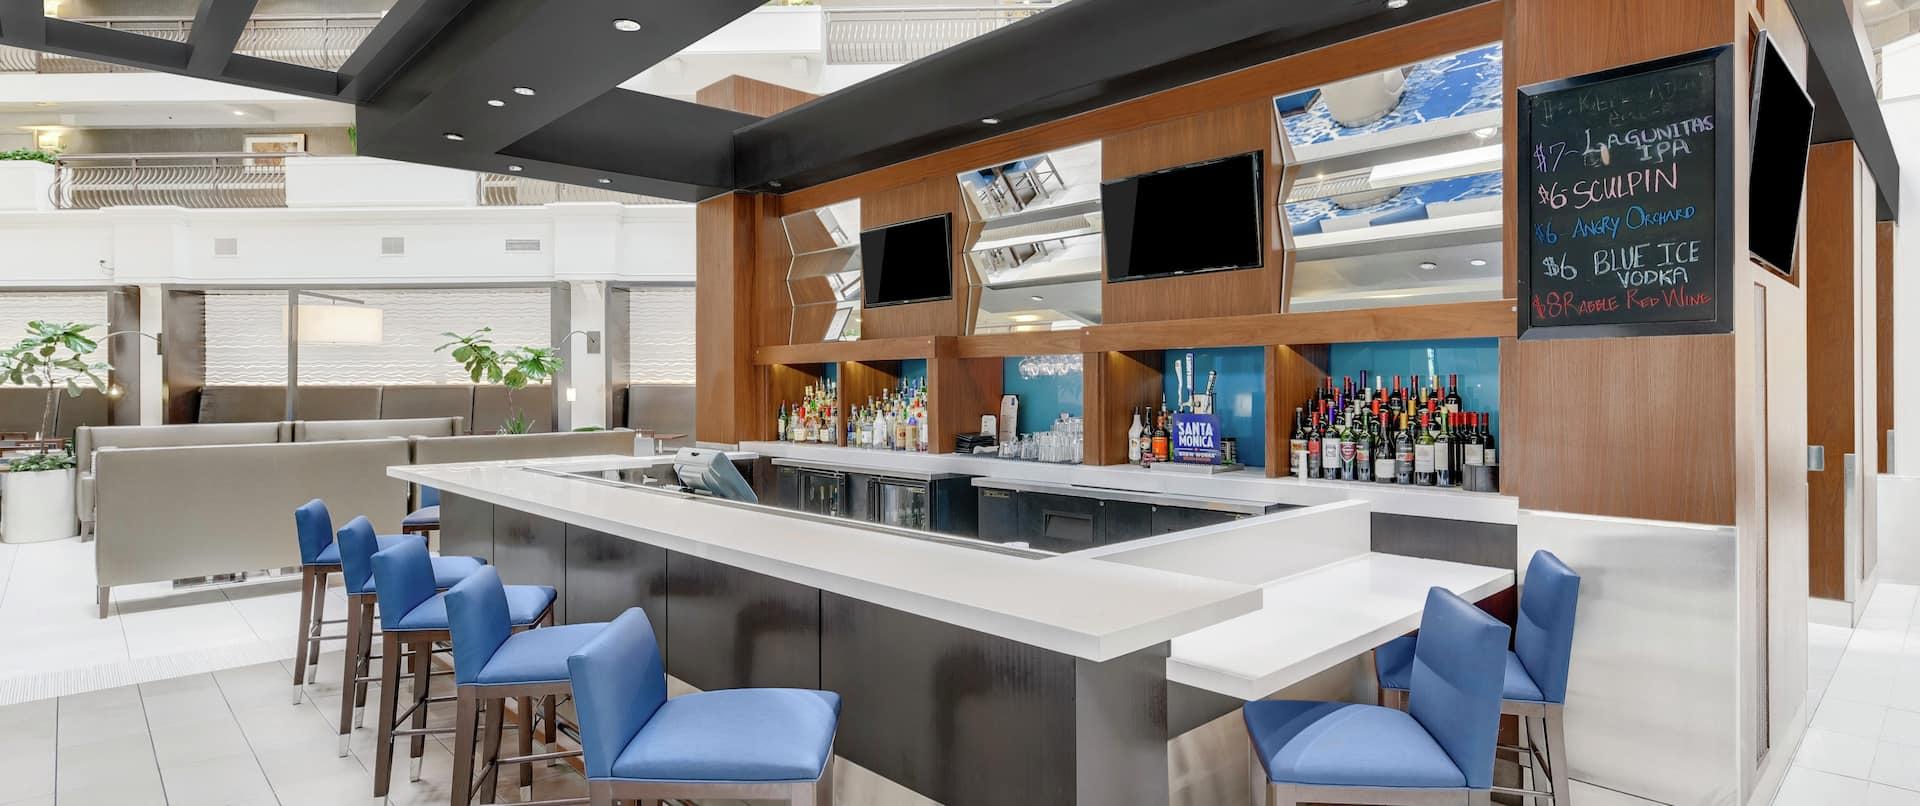 Cloud 9 Lounge and Bar